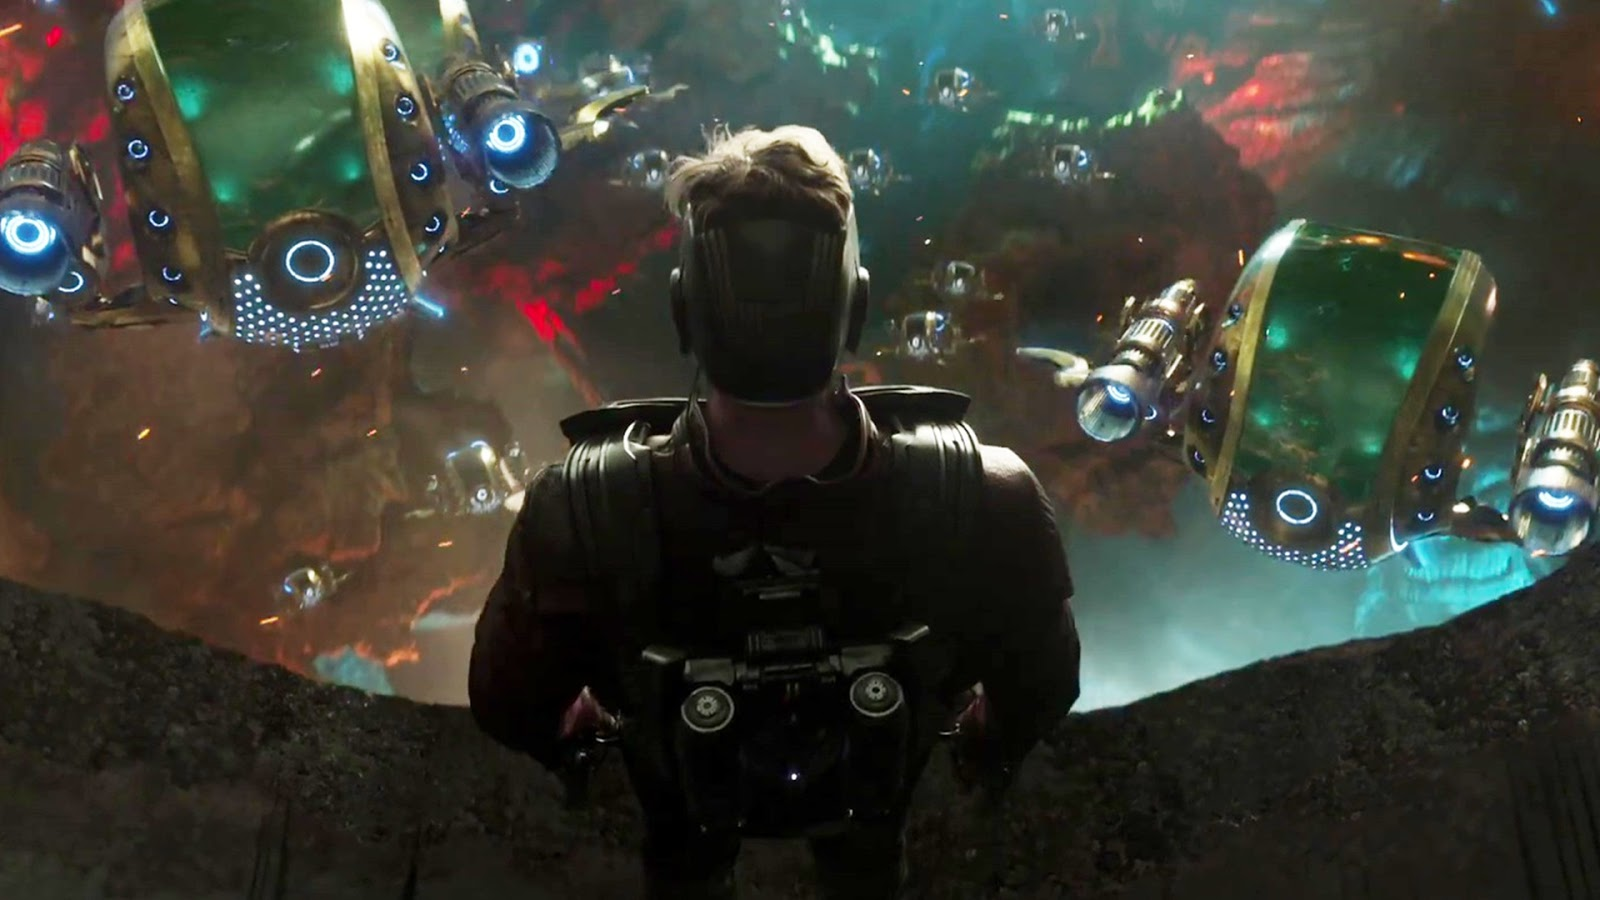 Guardians Of The Galaxy Vol 2 Wallpaper: BurtonReviews Guardians Of The Galaxy Vol. 2: Play It Again DJ